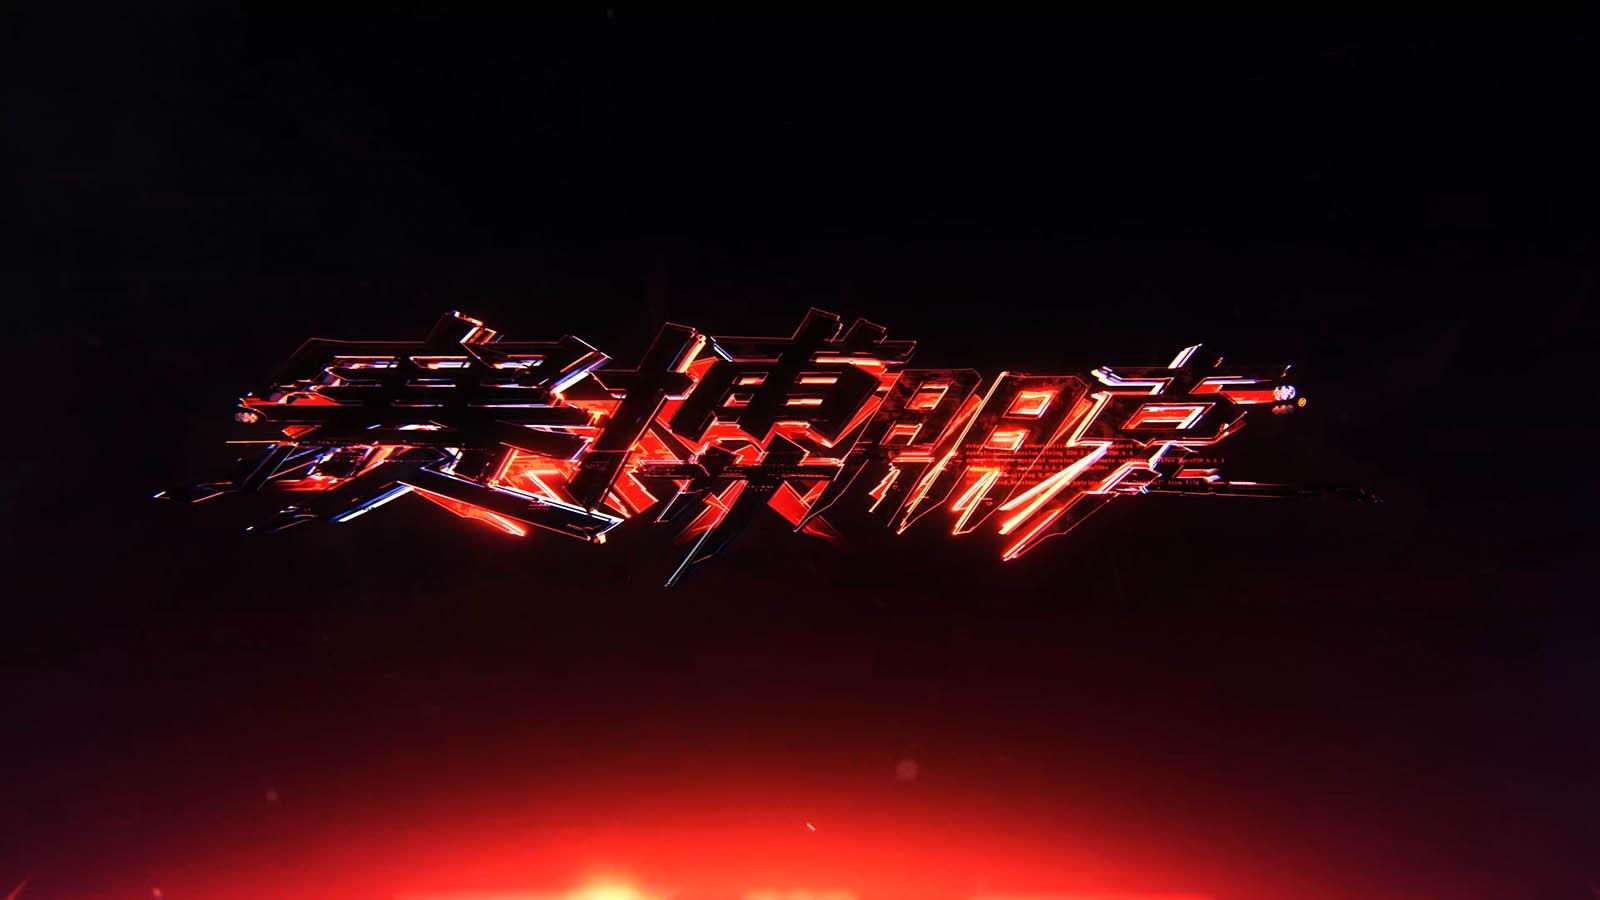 cyberpunk 2077 territory studio cyberpunk 2077 territory studio